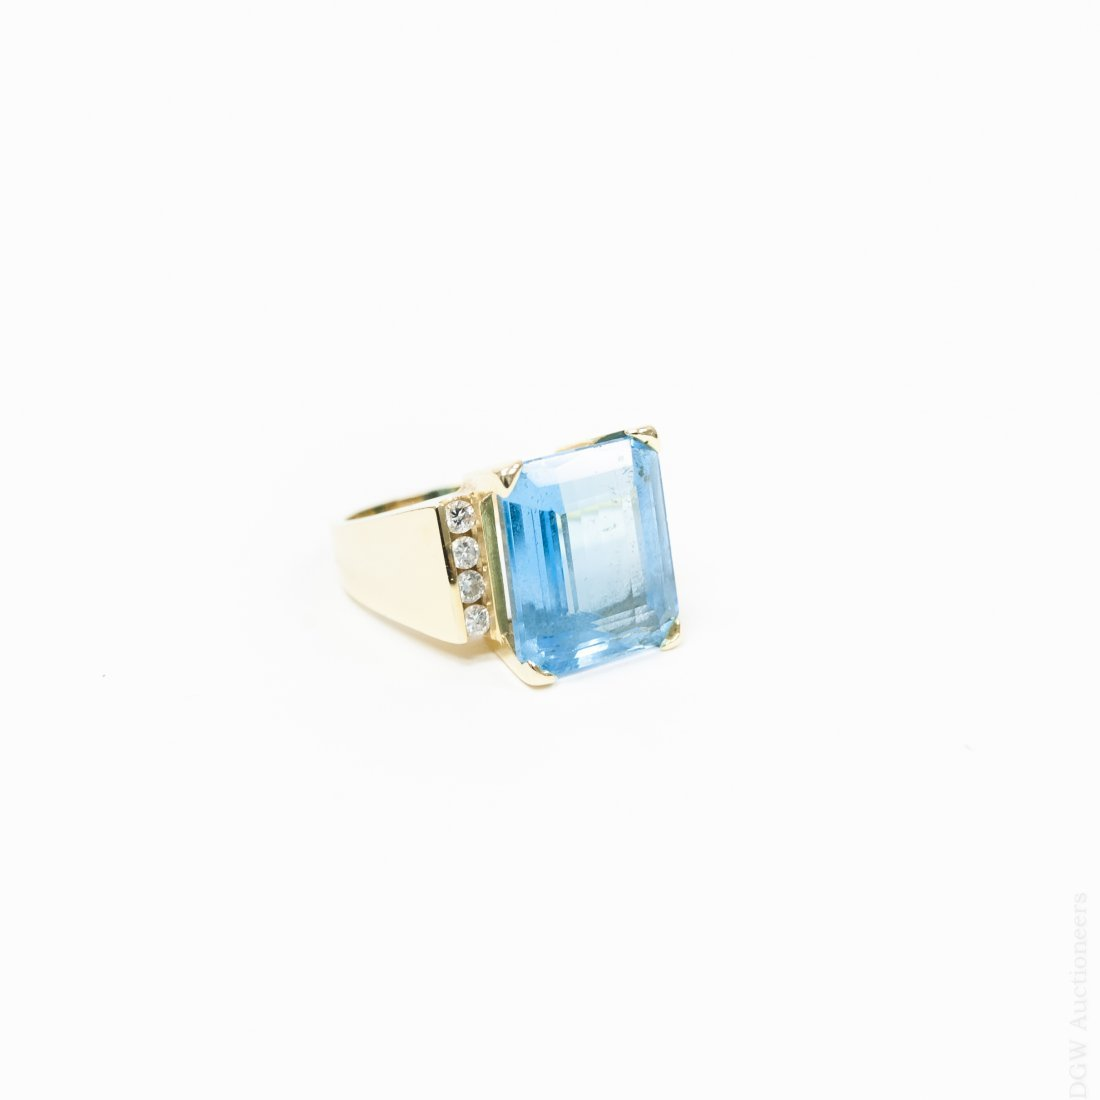 14K Yellow Gold, Blue Topaz & Diamond Ring.